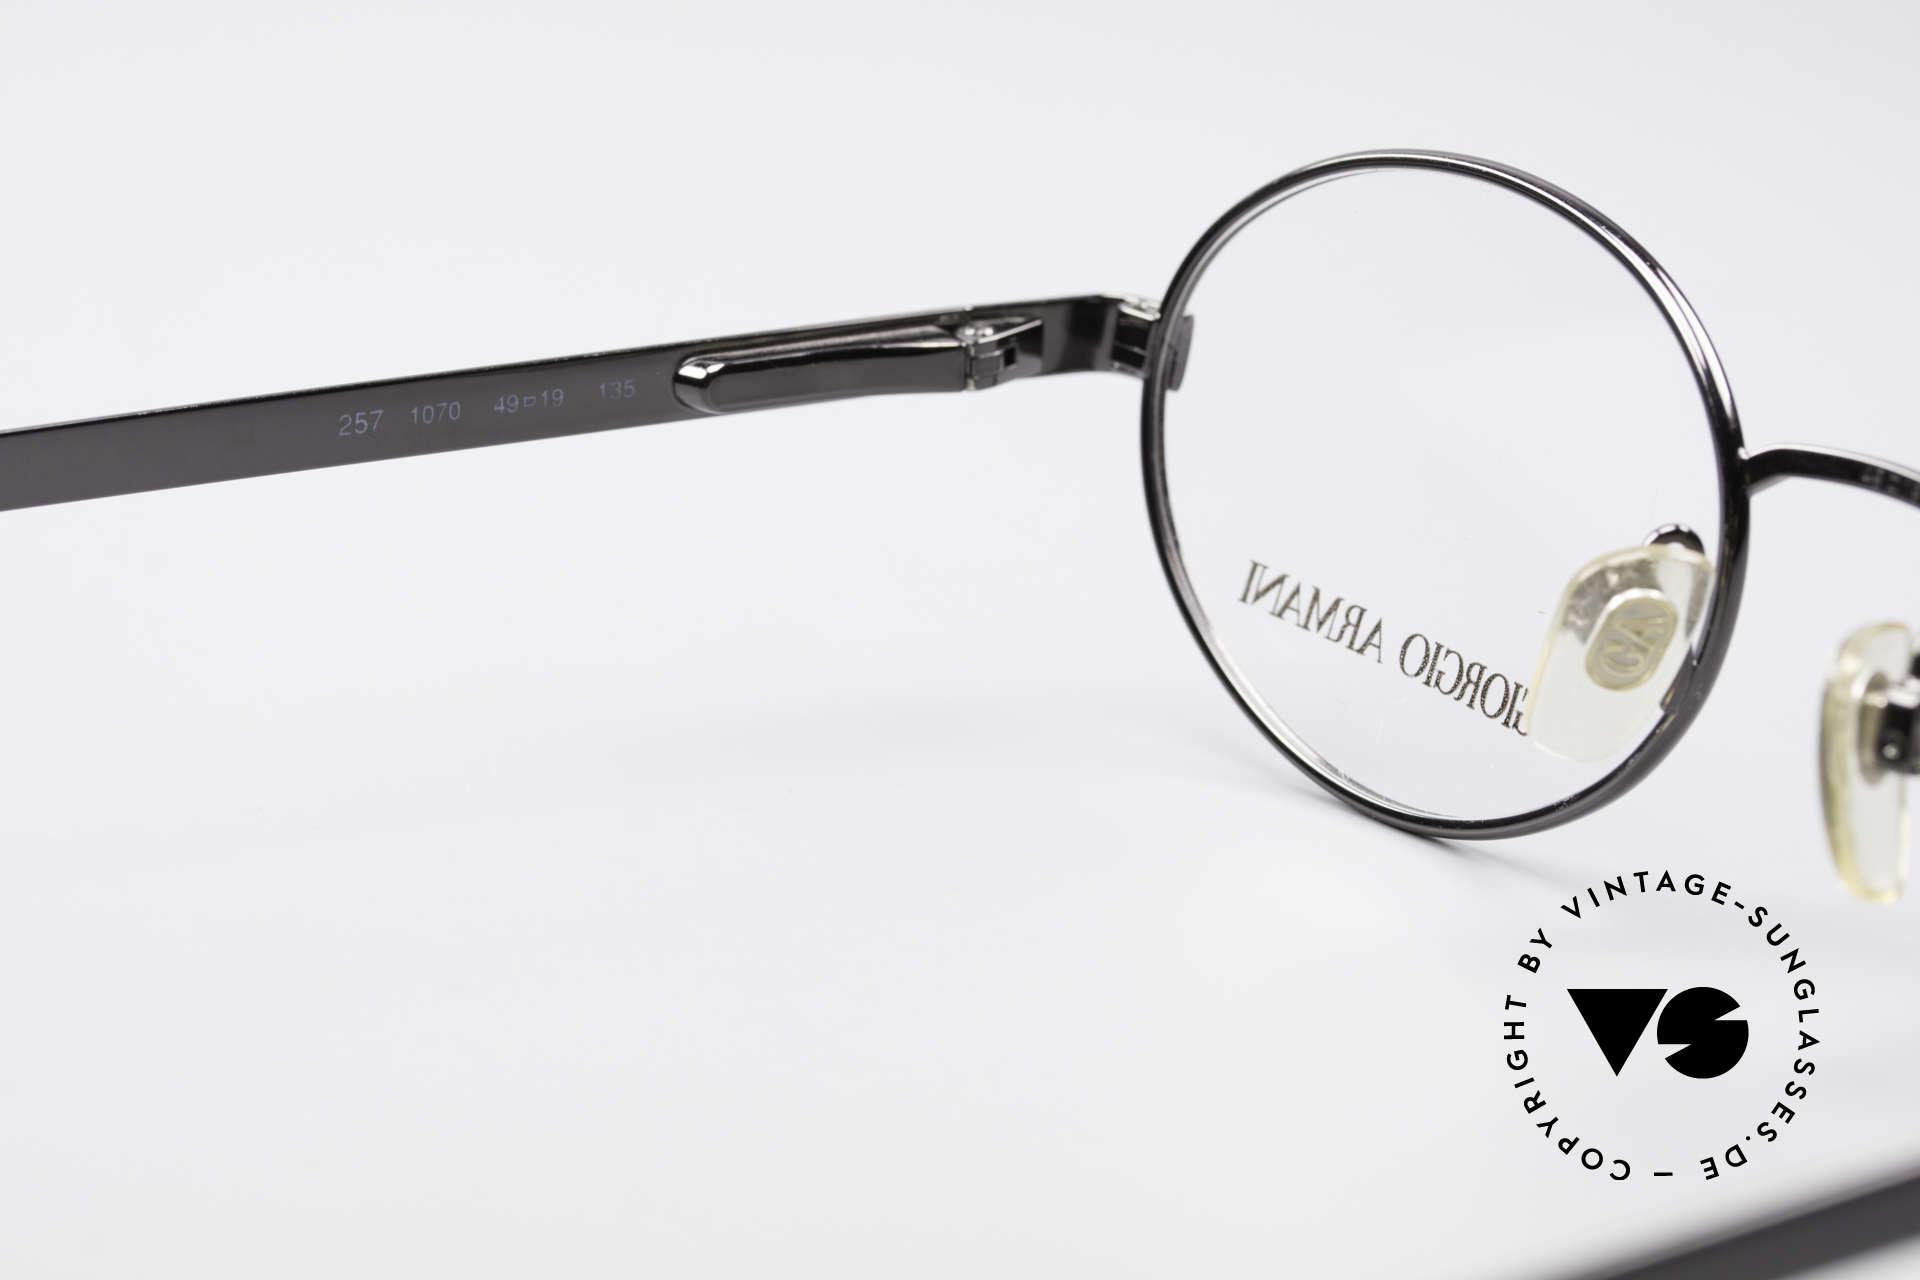 Giorgio Armani 257 90s Oval Vintage Eyeglasses, frame fits optical lenses or sun lenses optionally, Made for Men and Women